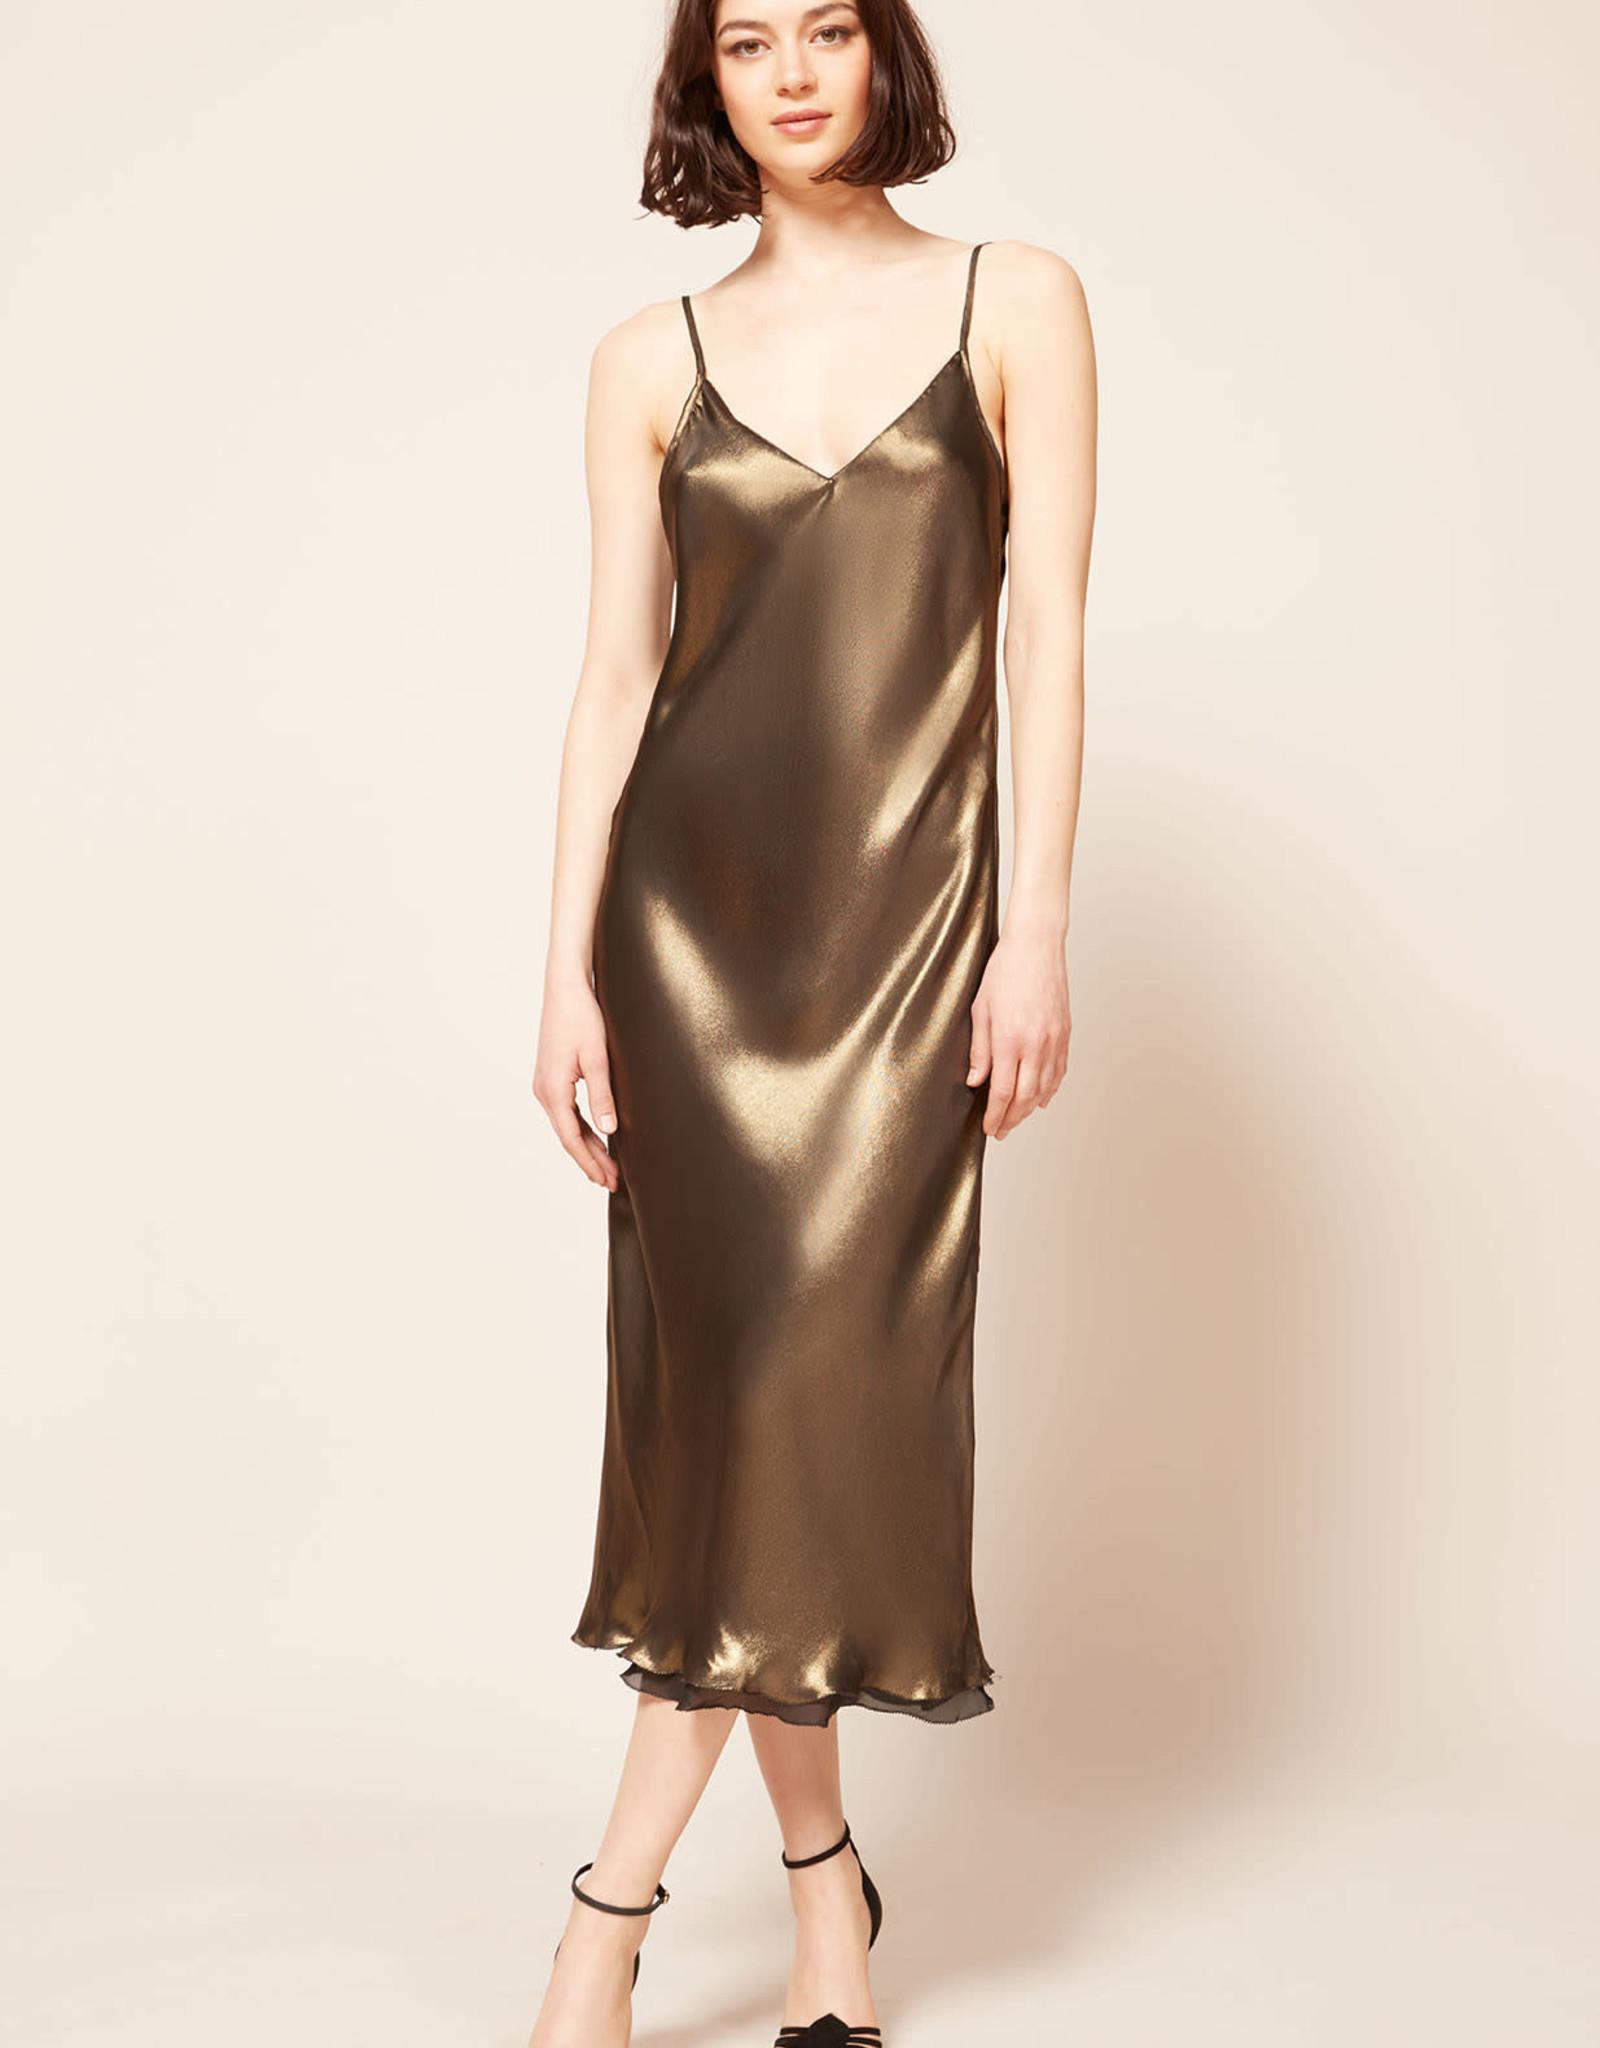 MES DEMOISELLES - Gotha Dress